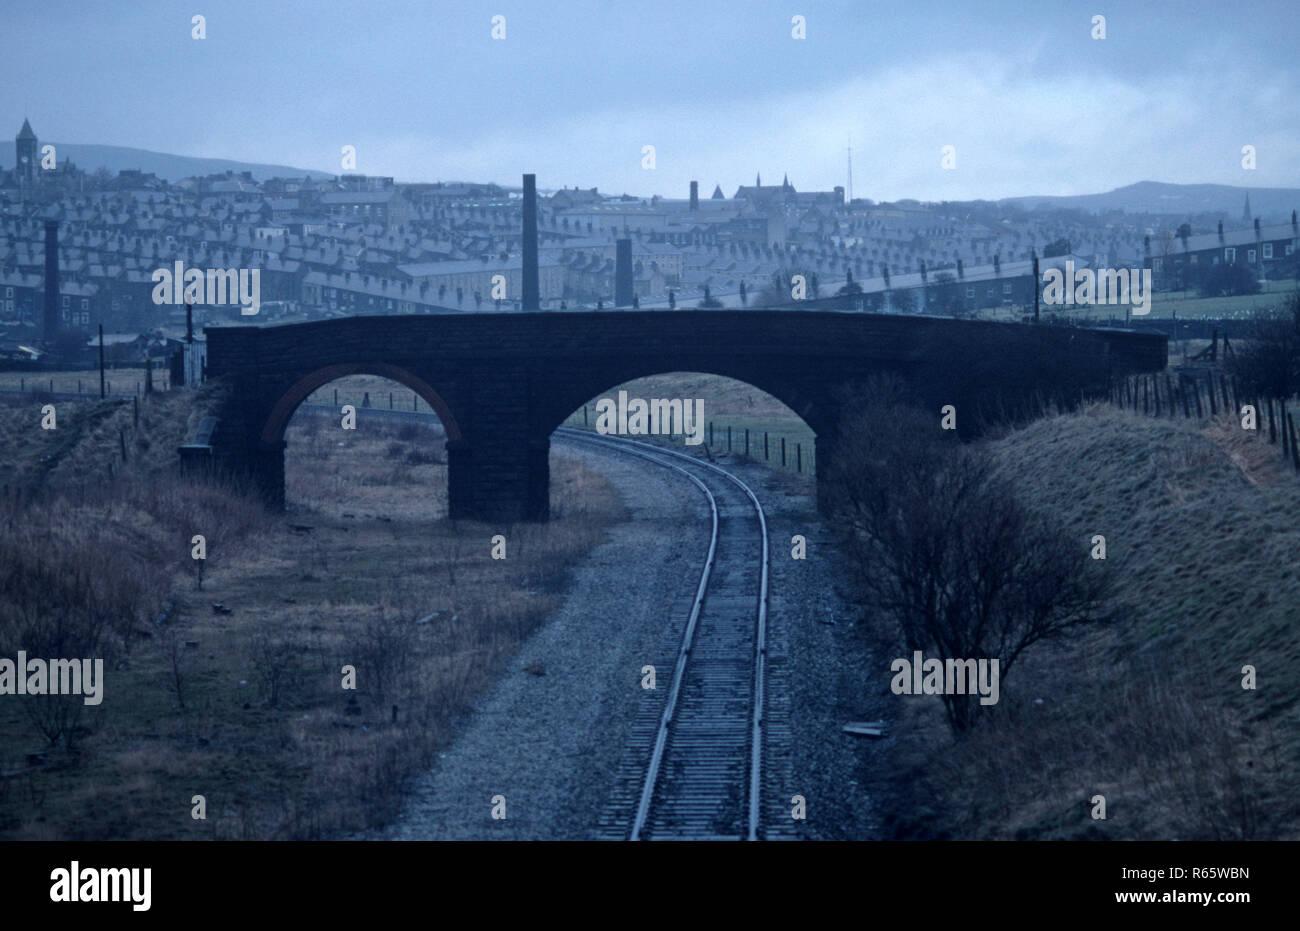 Railway Bridge over the British Rail Preston to Colne railway line, Lancashire, Great Britain - Stock Image